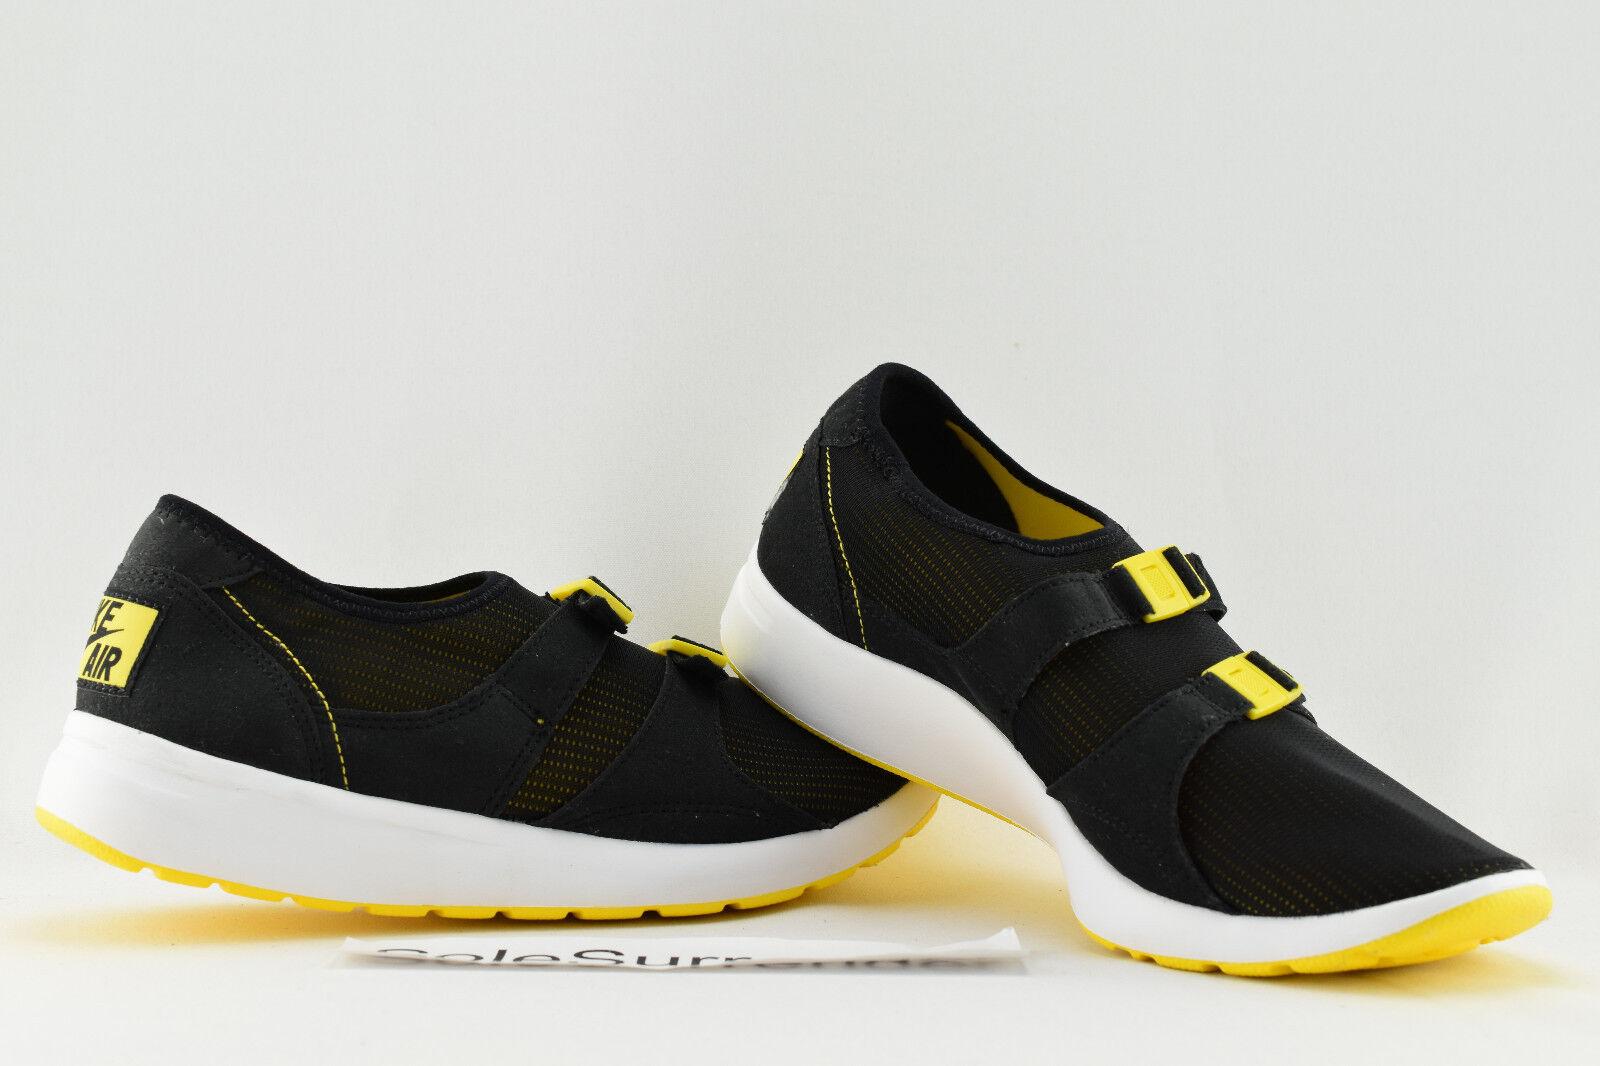 Nike Air Sock Racer OG - SIZE 9.5 - NEW - 875837-001 Black Tour Yellow White  Seasonal price cuts, discount benefits